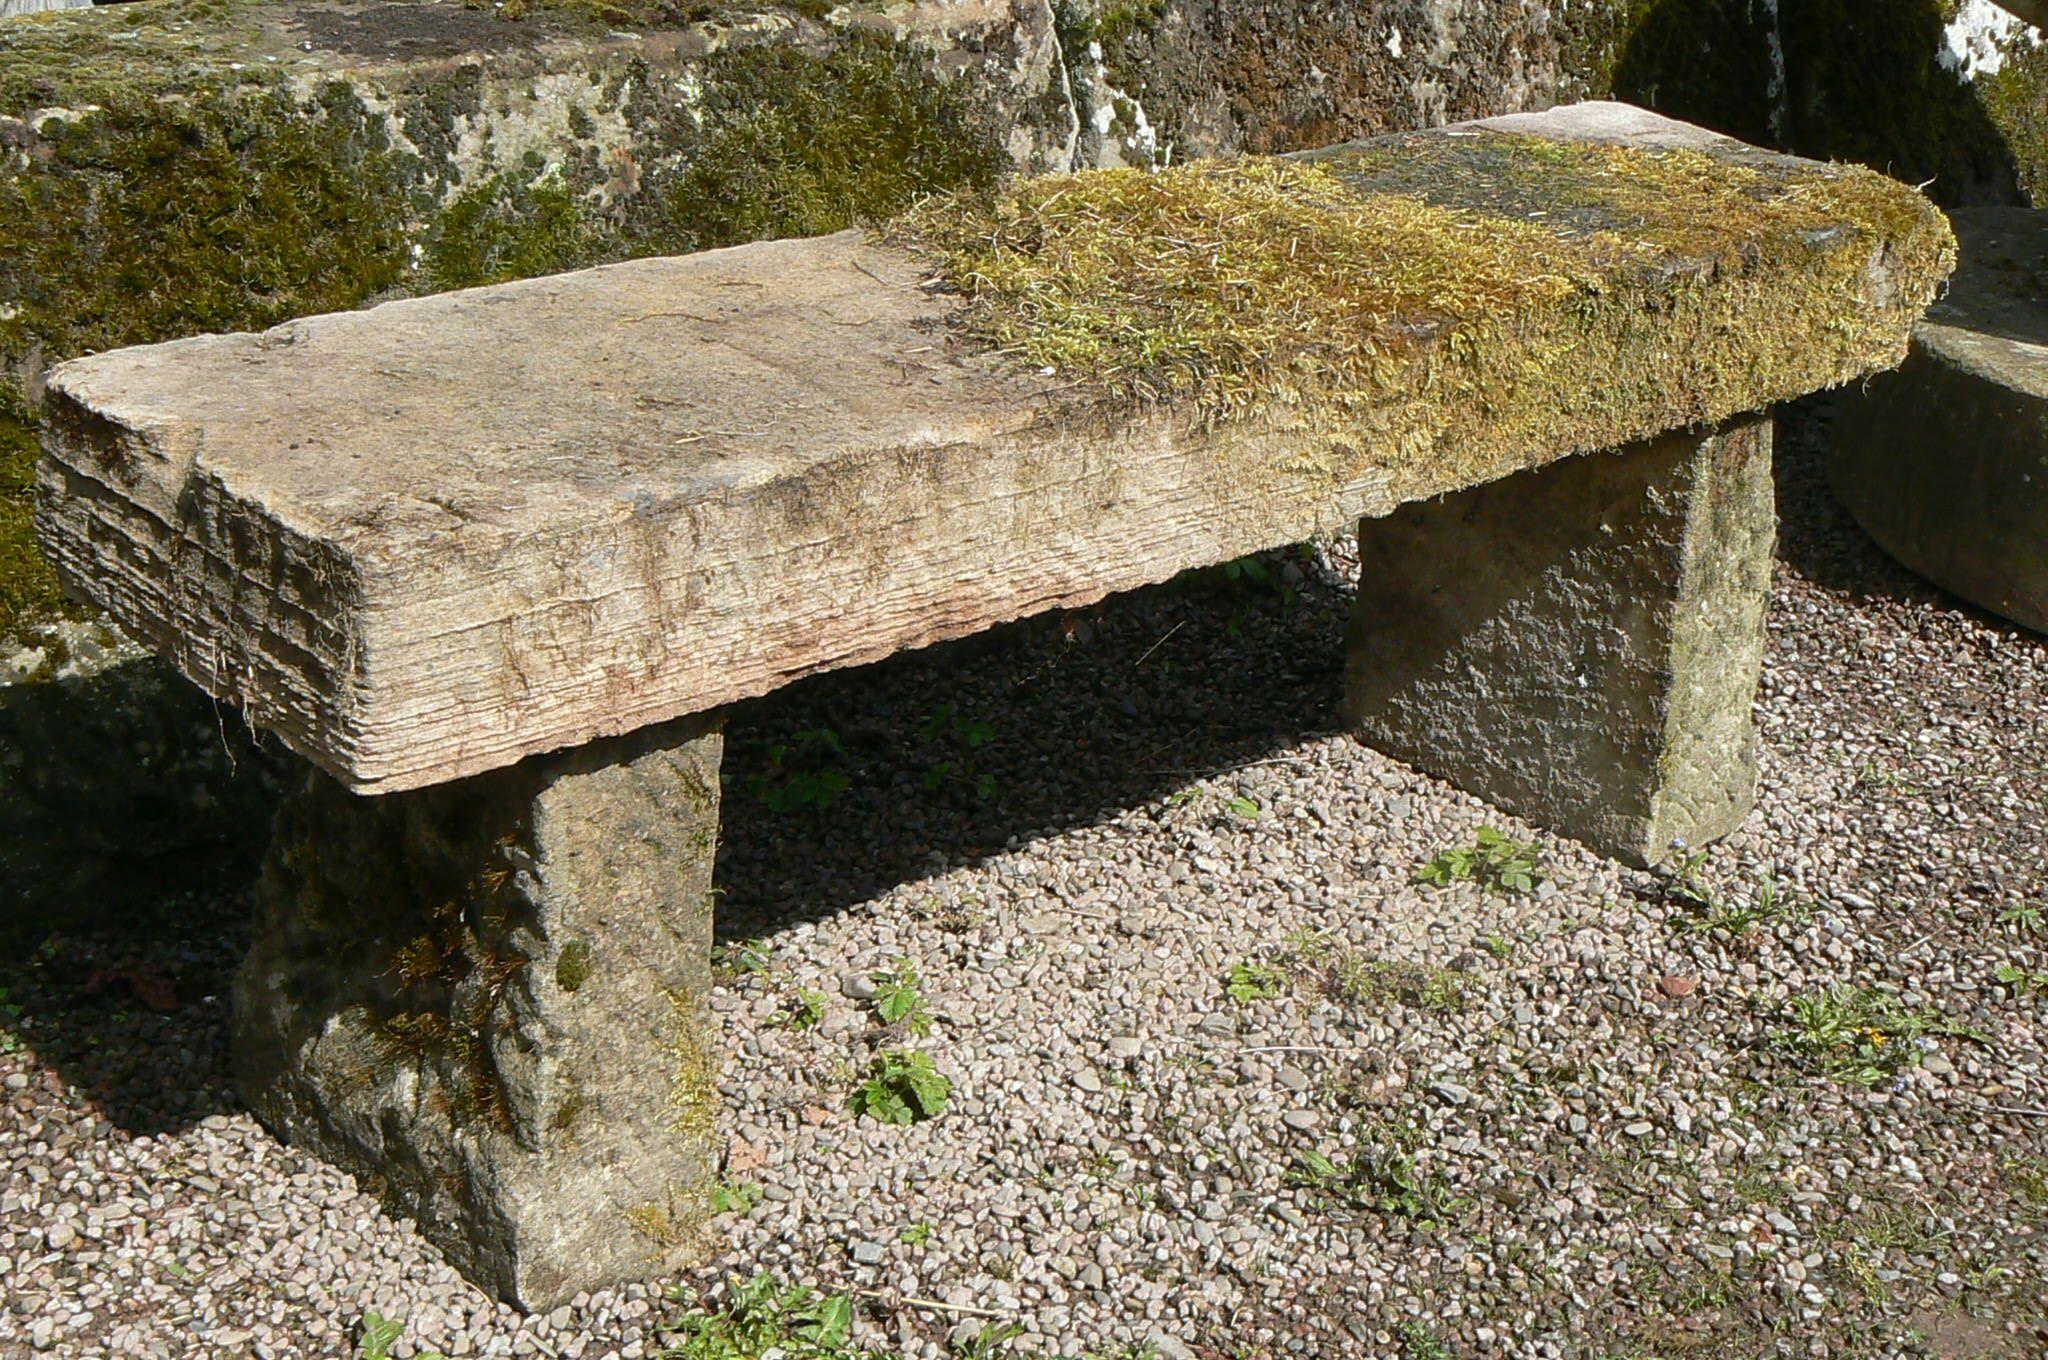 GARDEN BENCHES | ... Garden Antiques   Benches And Garden Furniture   Old  Stone